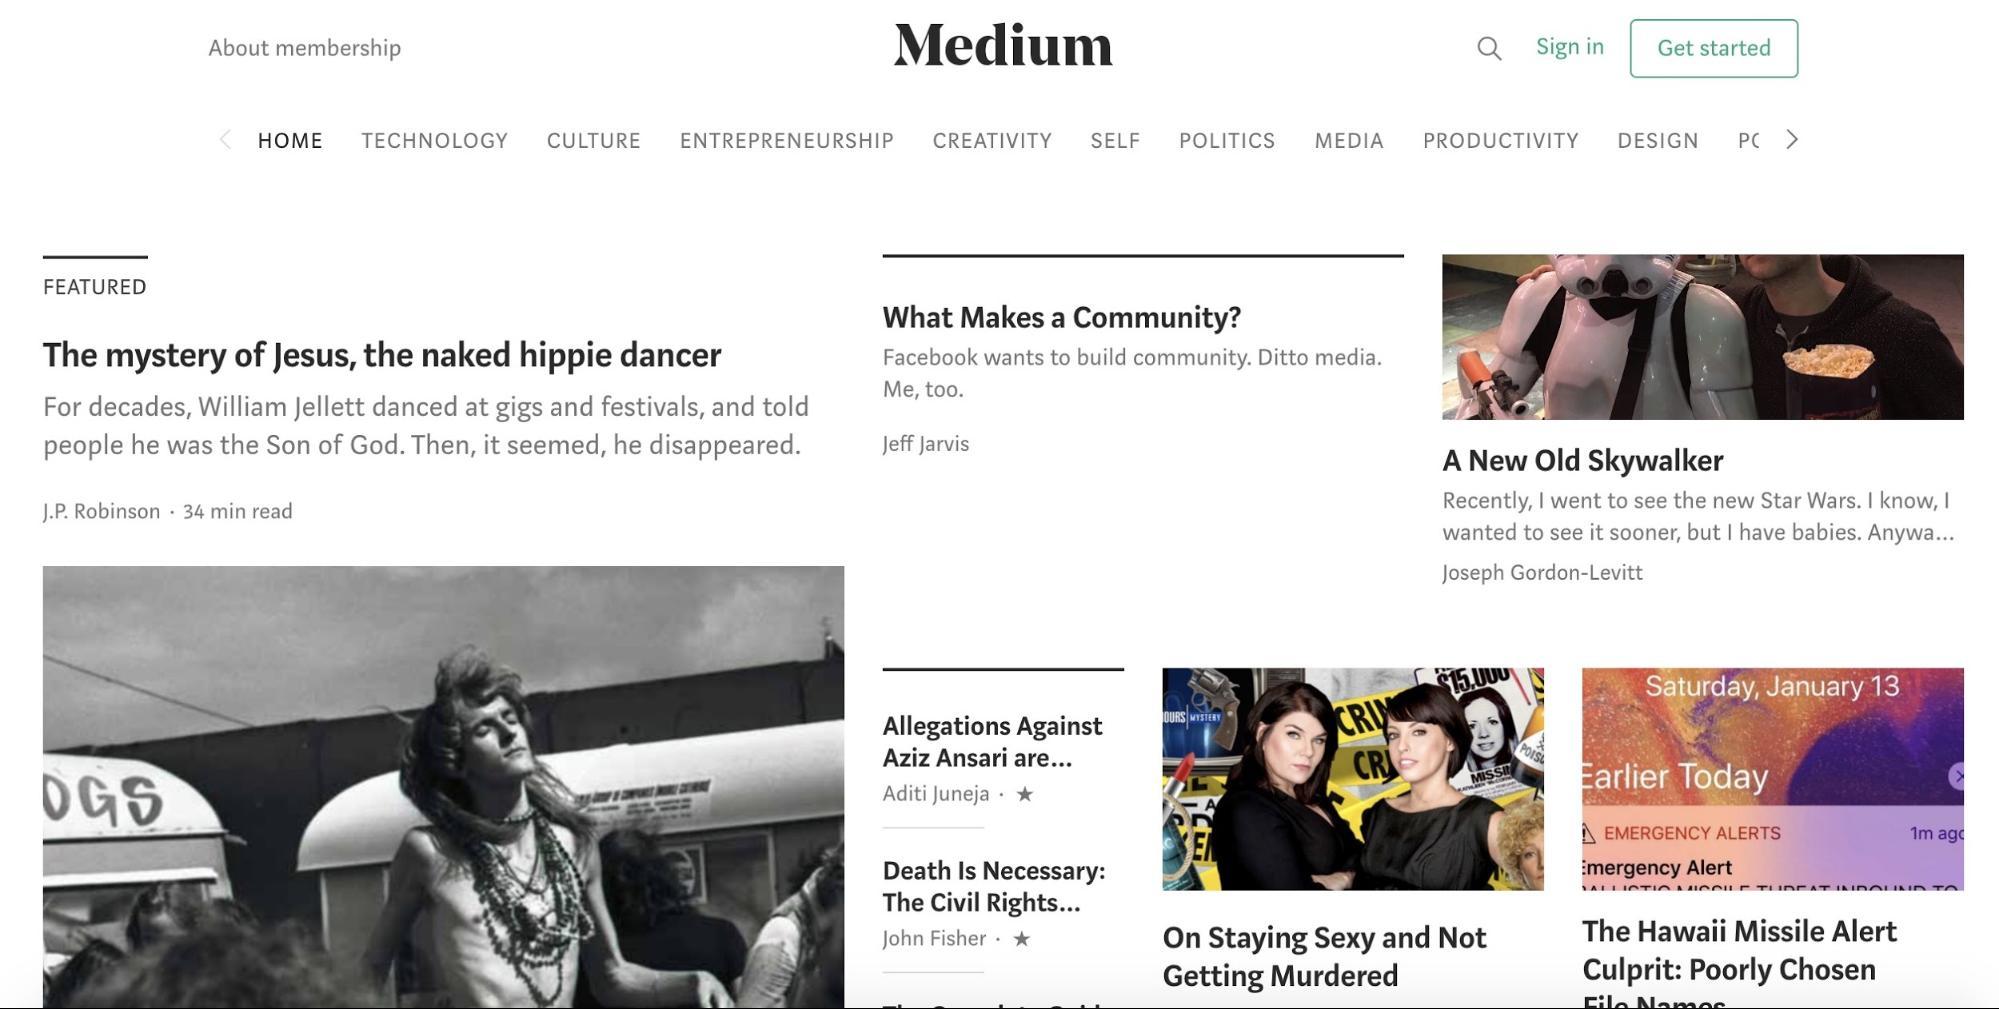 Medium Blogging Platform